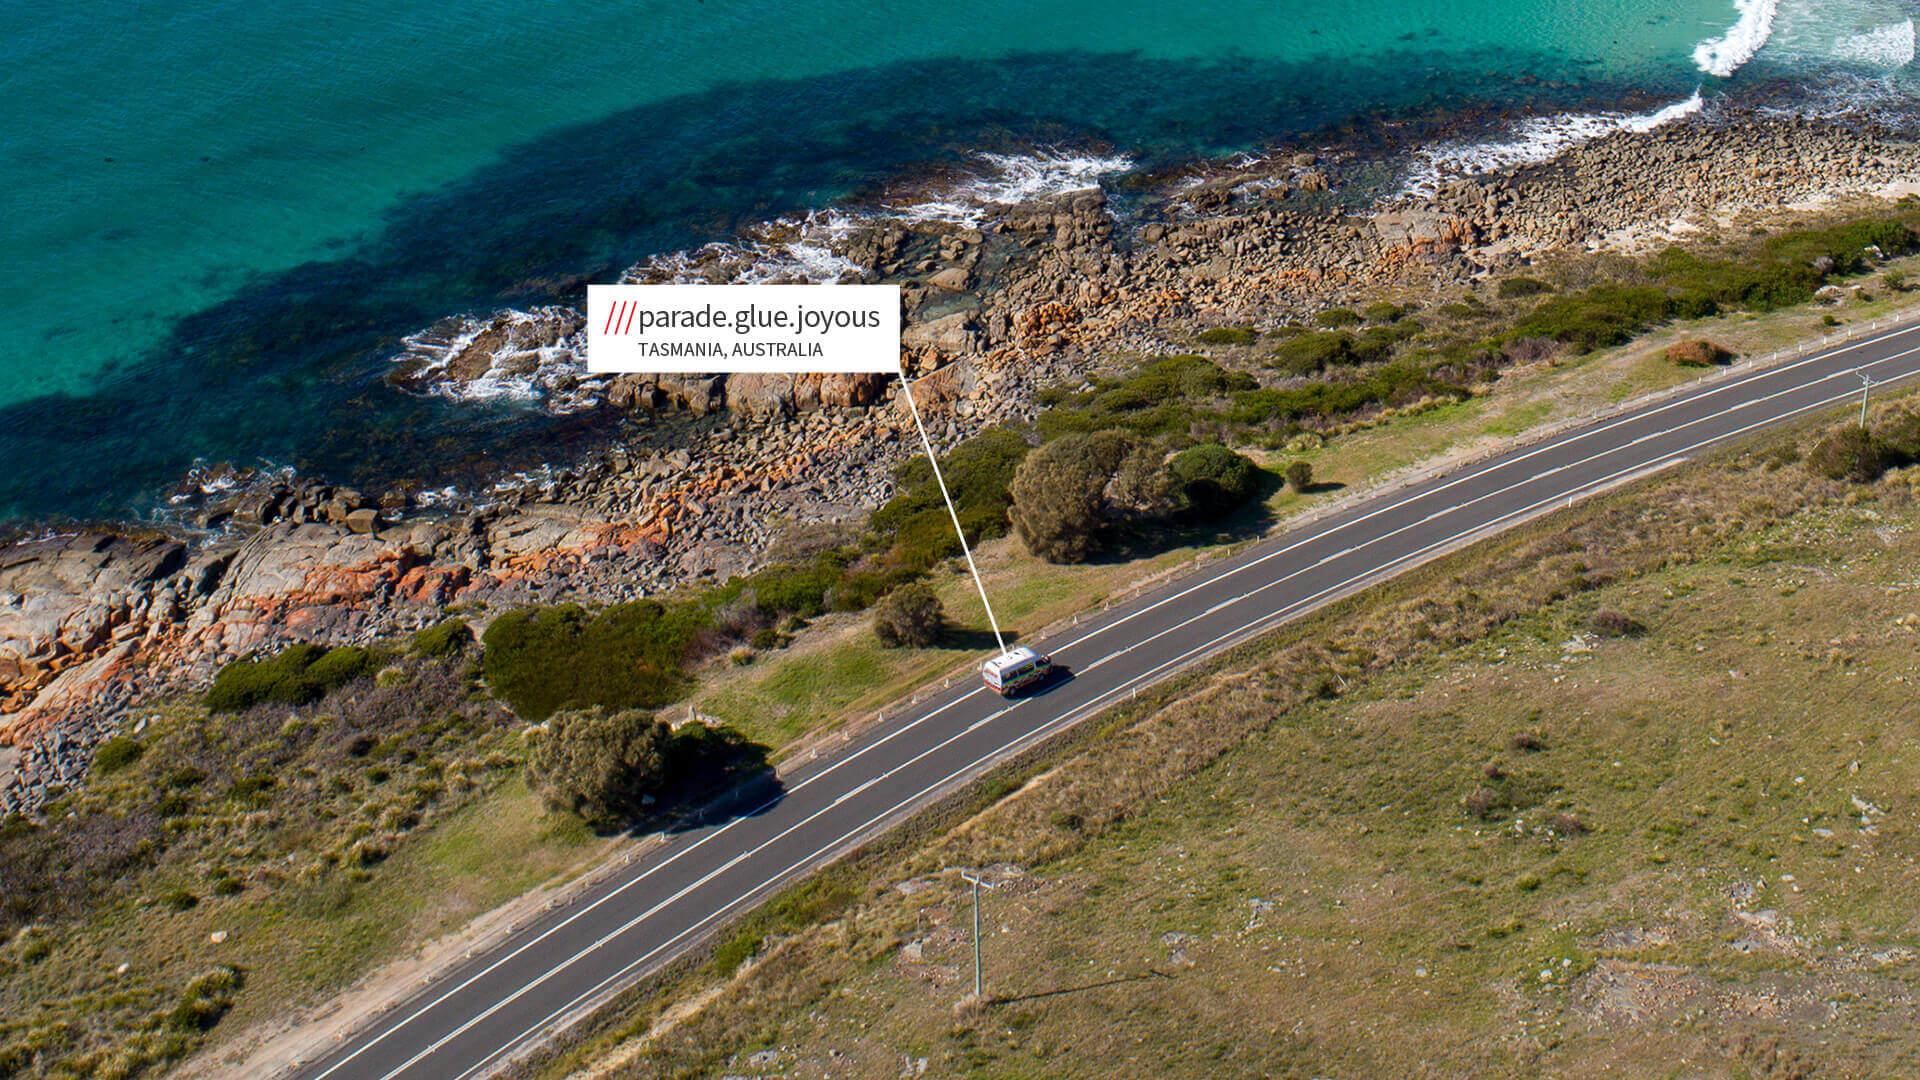 Ambulance in Tazmania Australia - call-out image